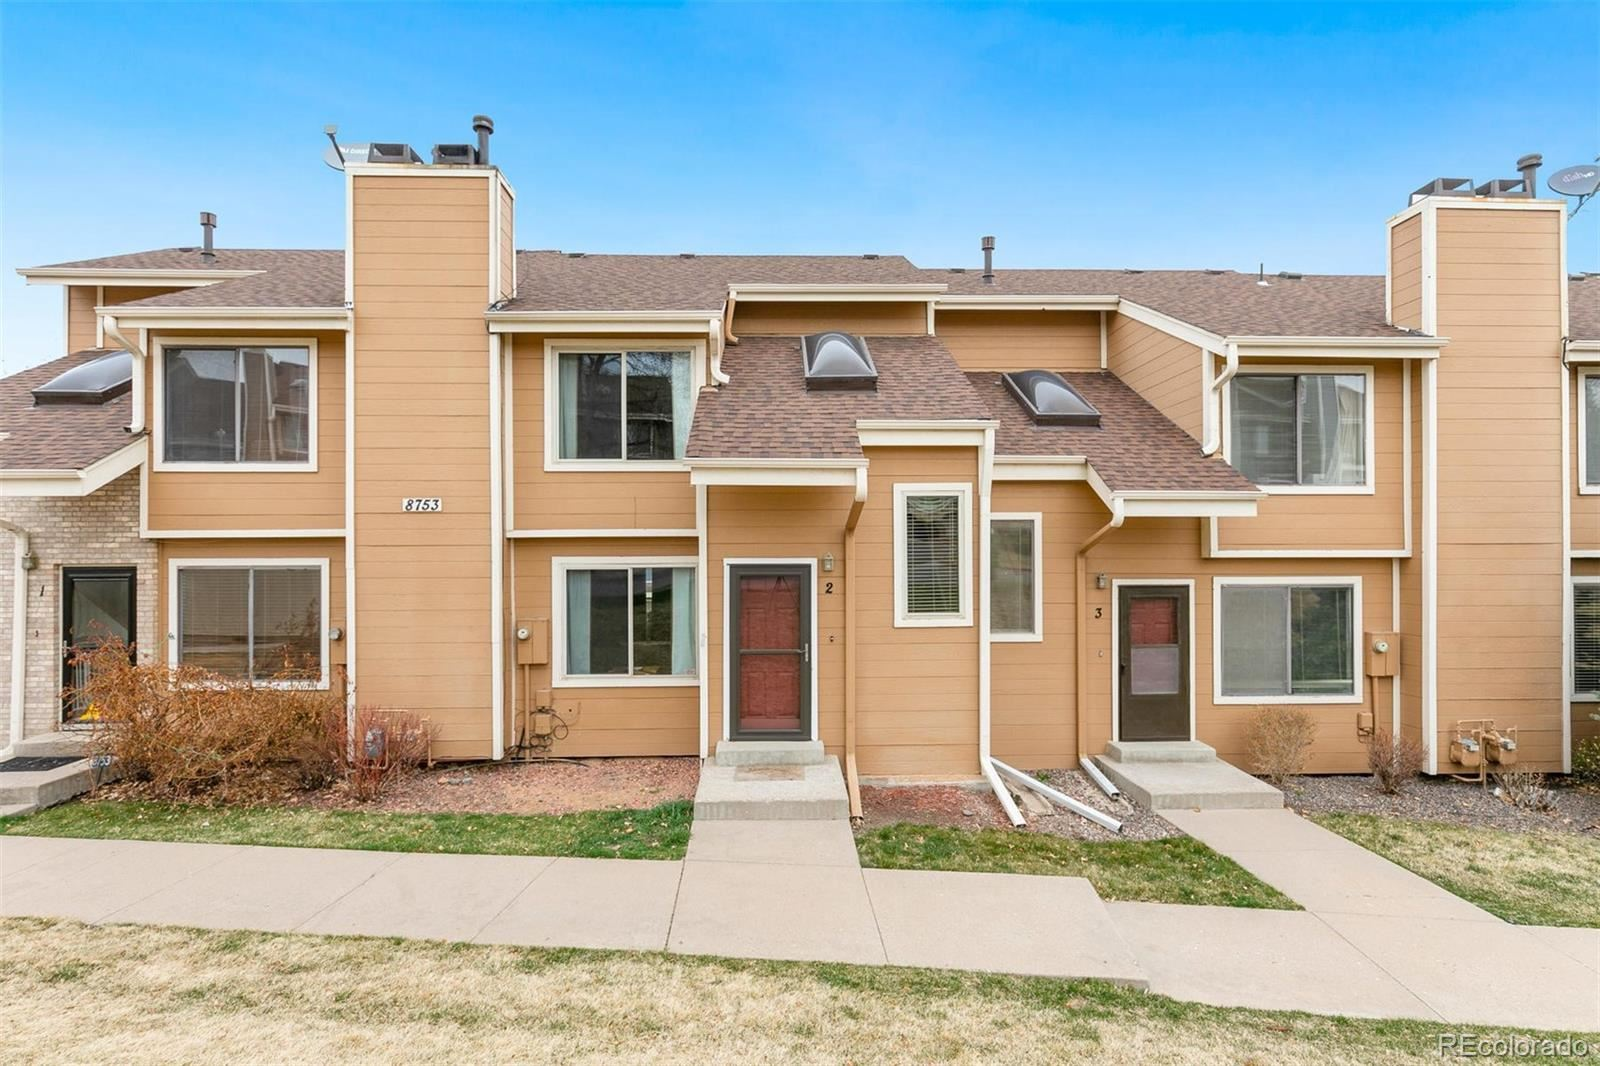 8753 W Cornell Avenue  12-2 #12-2, Lakewood, CO 80227 - #: 6787567